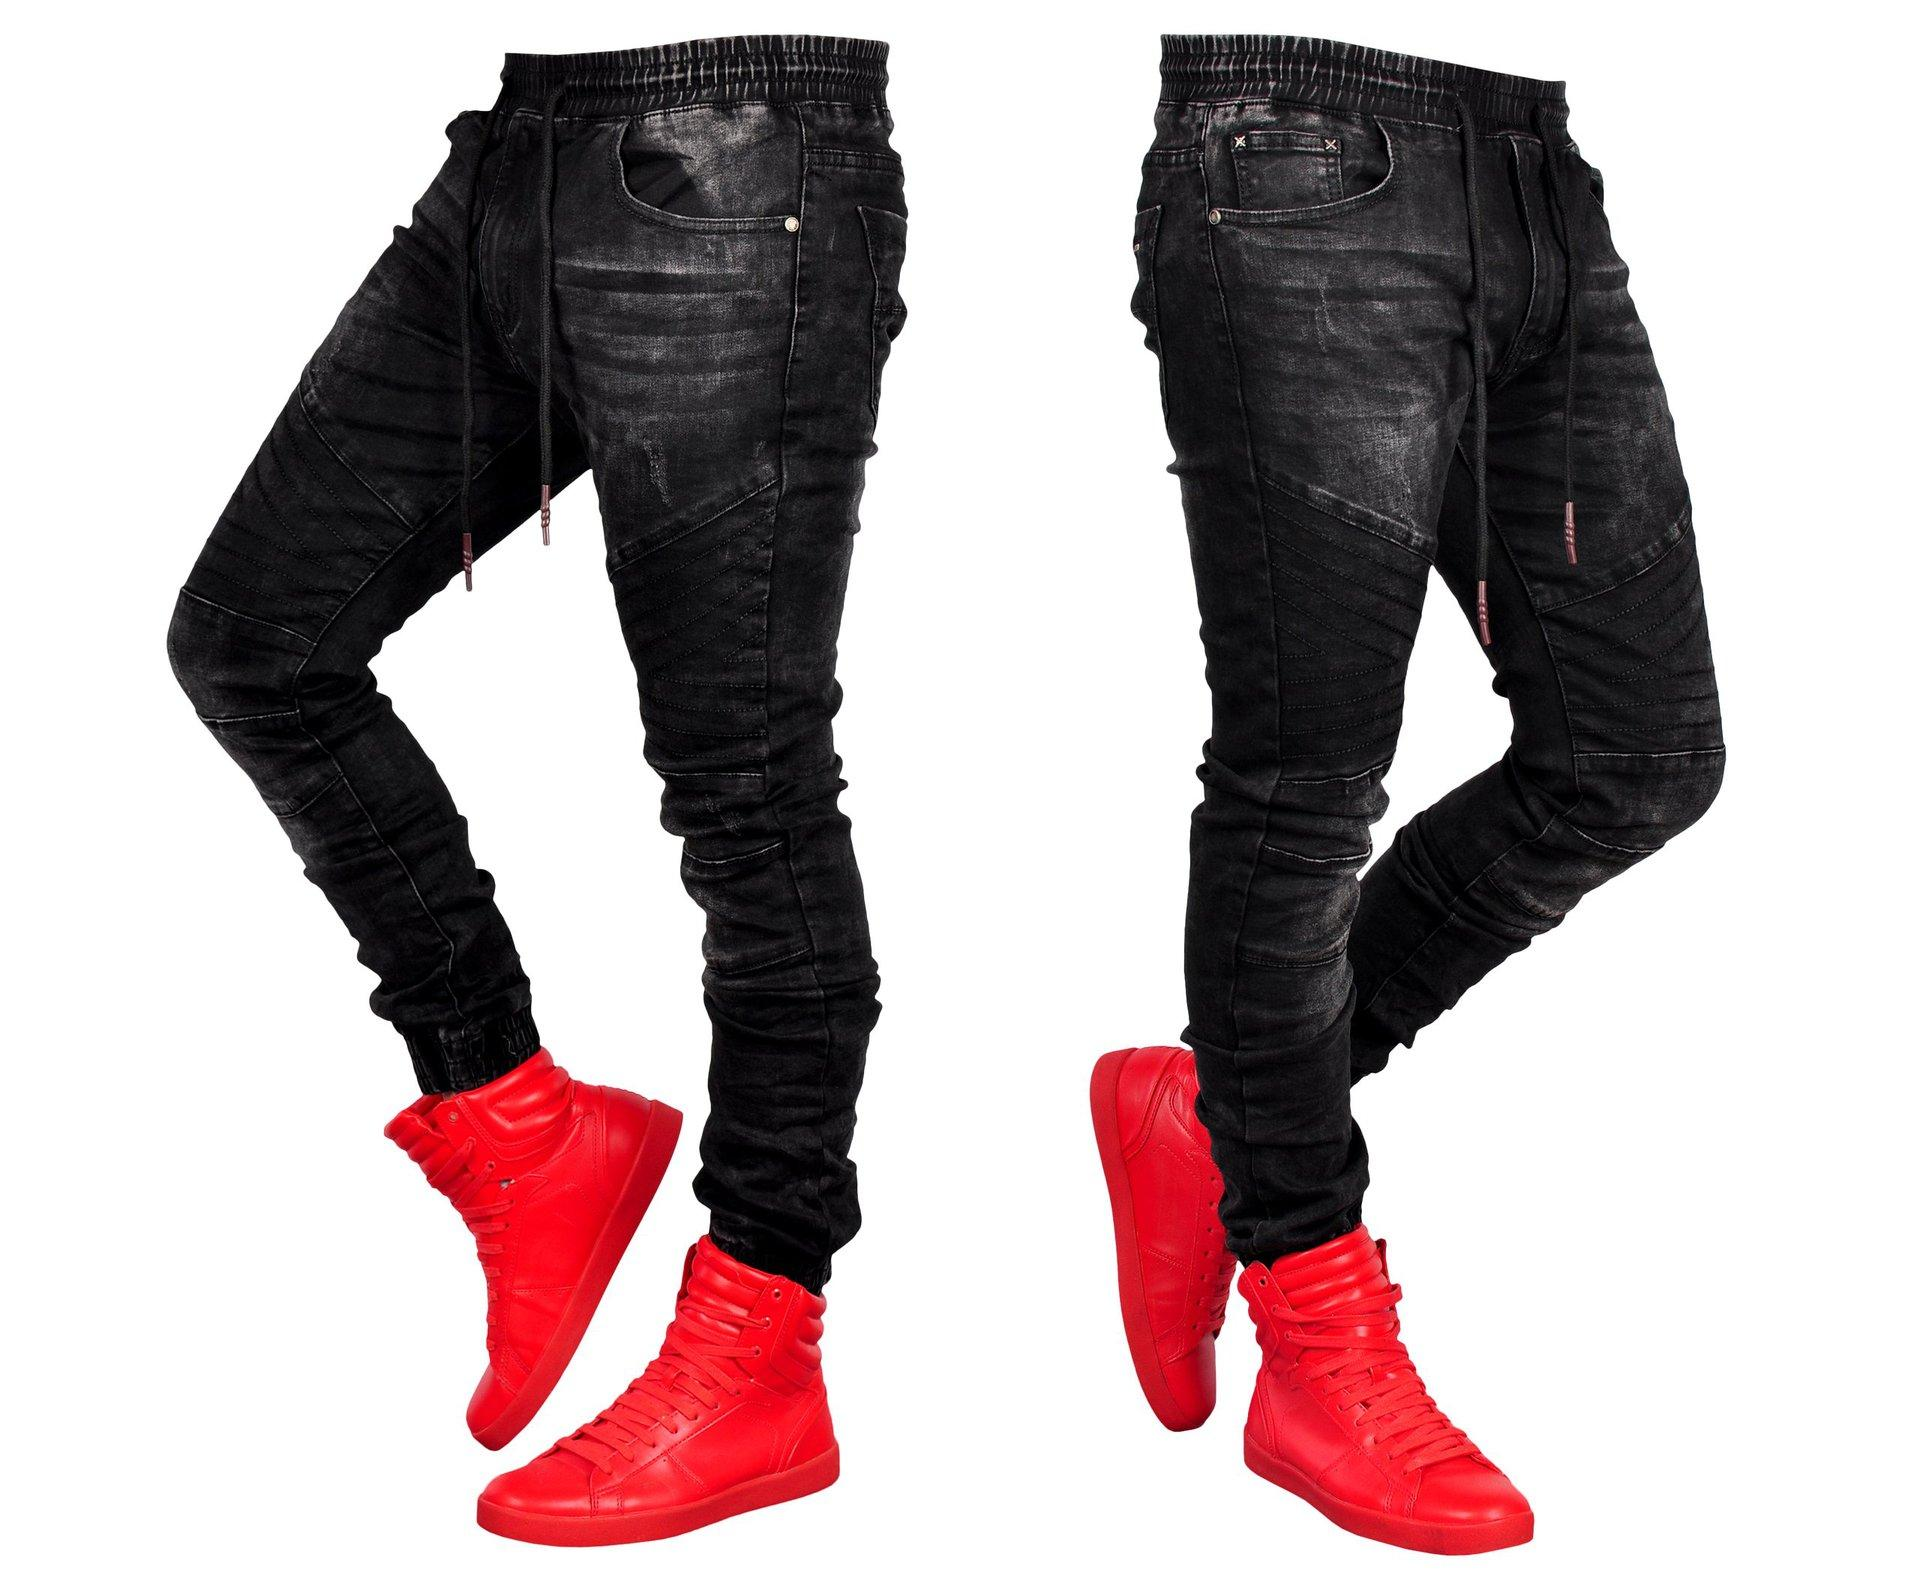 jeans for men Stylish black jeans jogger fashion elastic waist denim trousers Pencil Biker Jean Pants